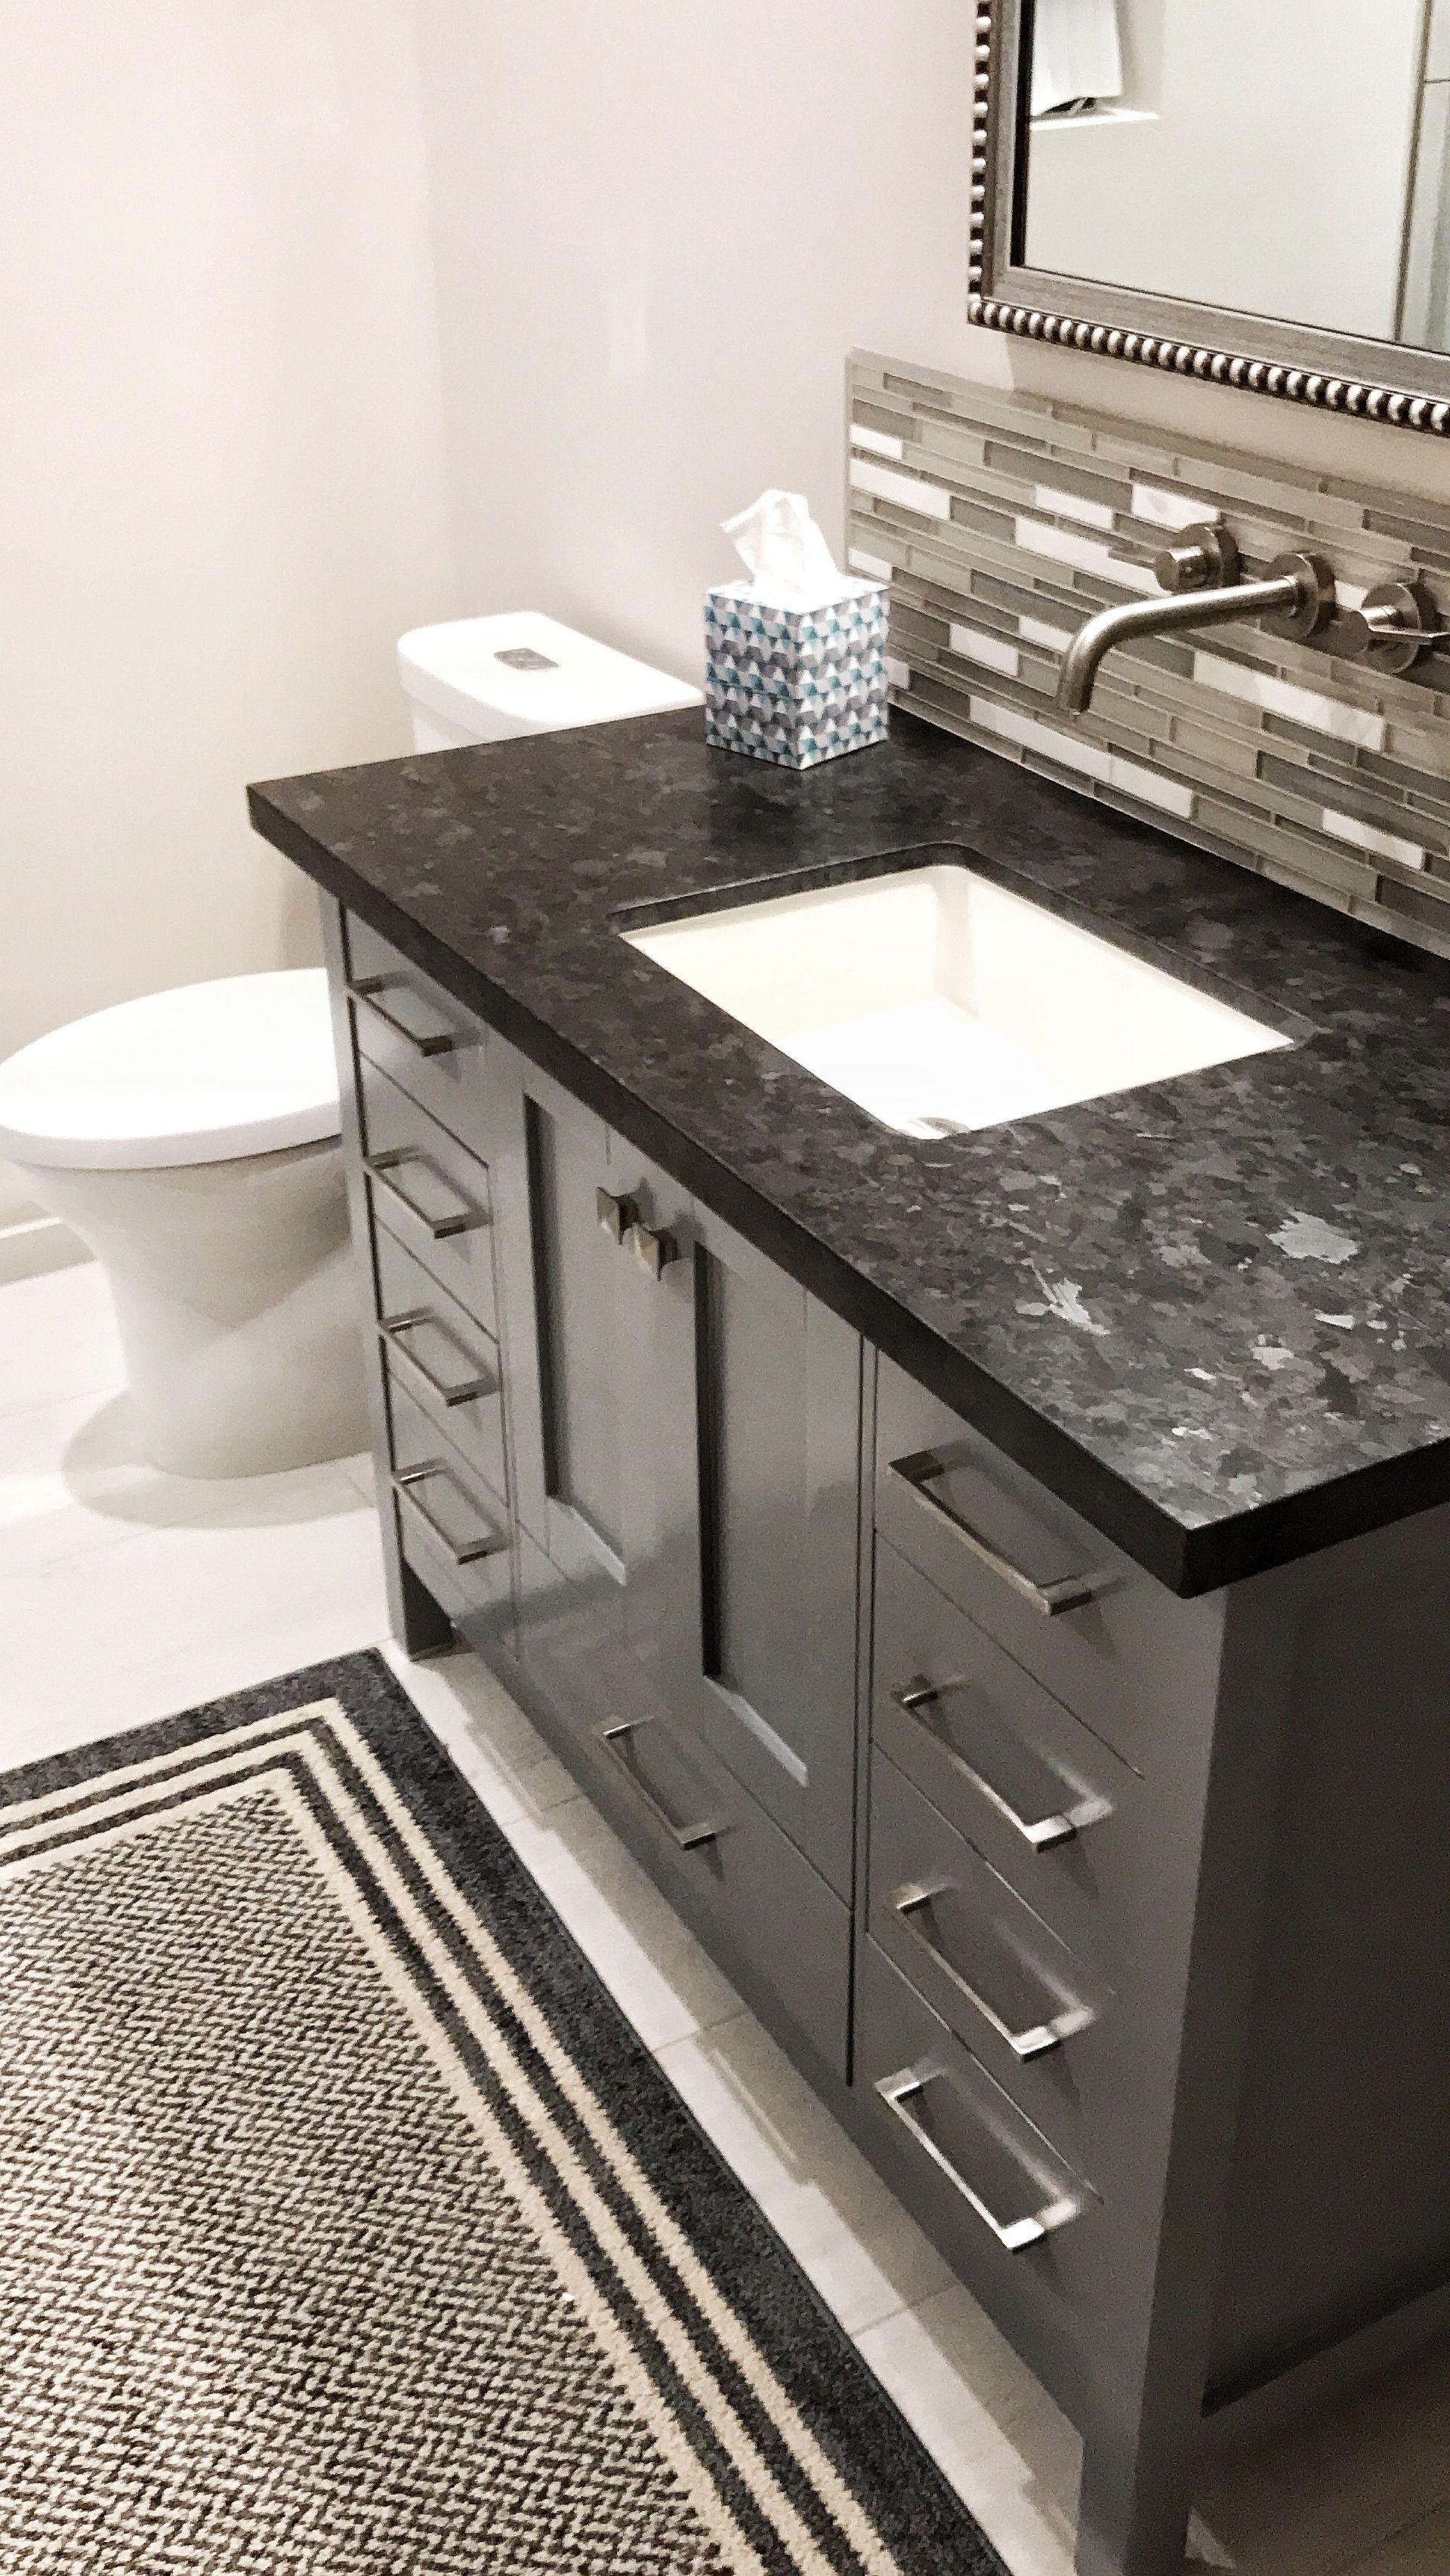 Guest Bathroom Transitional Bathroom Design Guest Bathroom Design Kitchen Design Showrooms